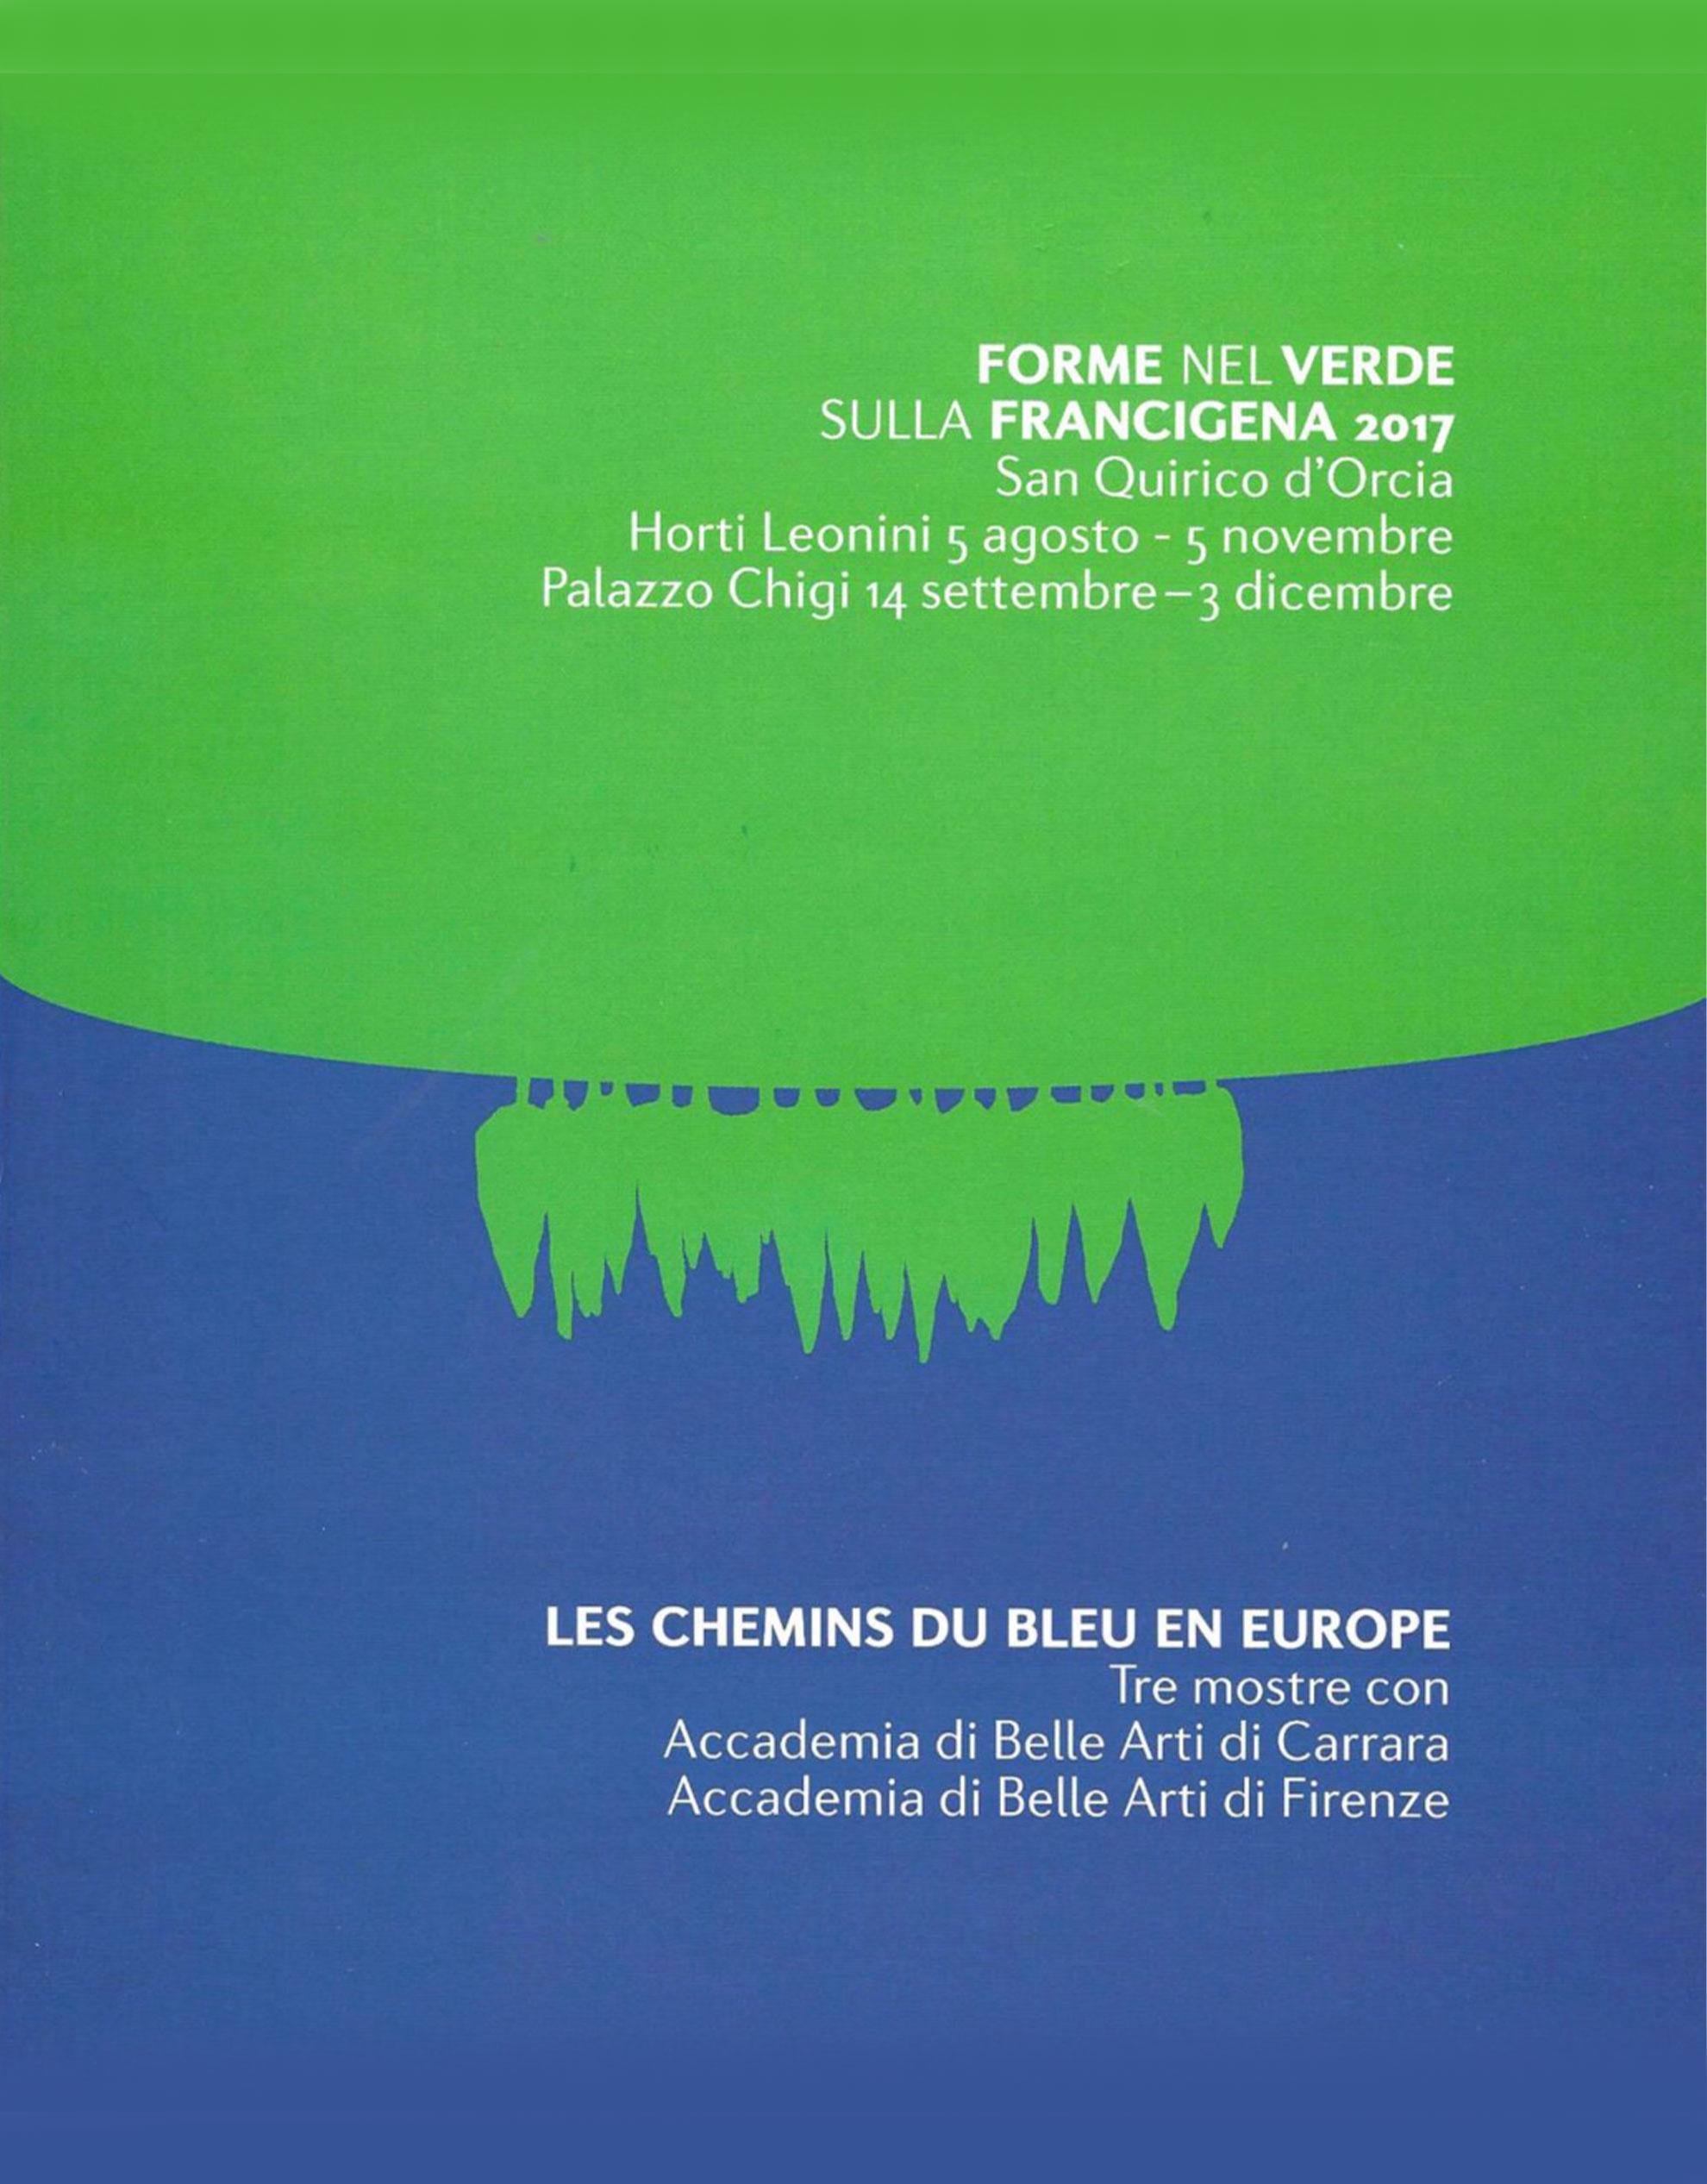 Catalogo Forme nel Verde 2017